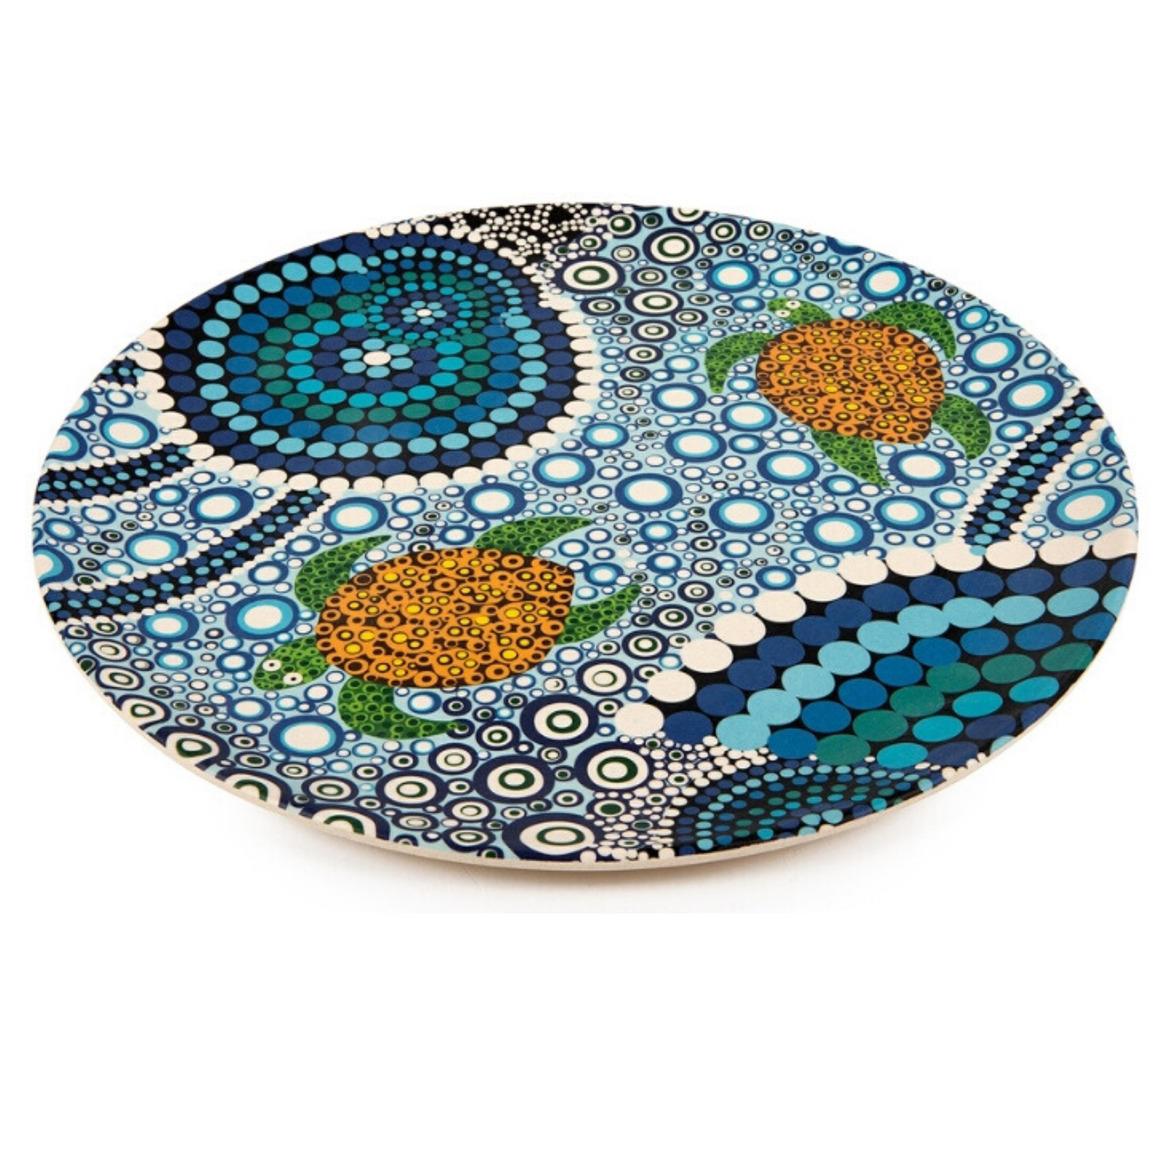 Plate Bamboo Aboriginal Design - Colours of the Reef Design  - Colin Jones Set of 2   Trada Marketplace